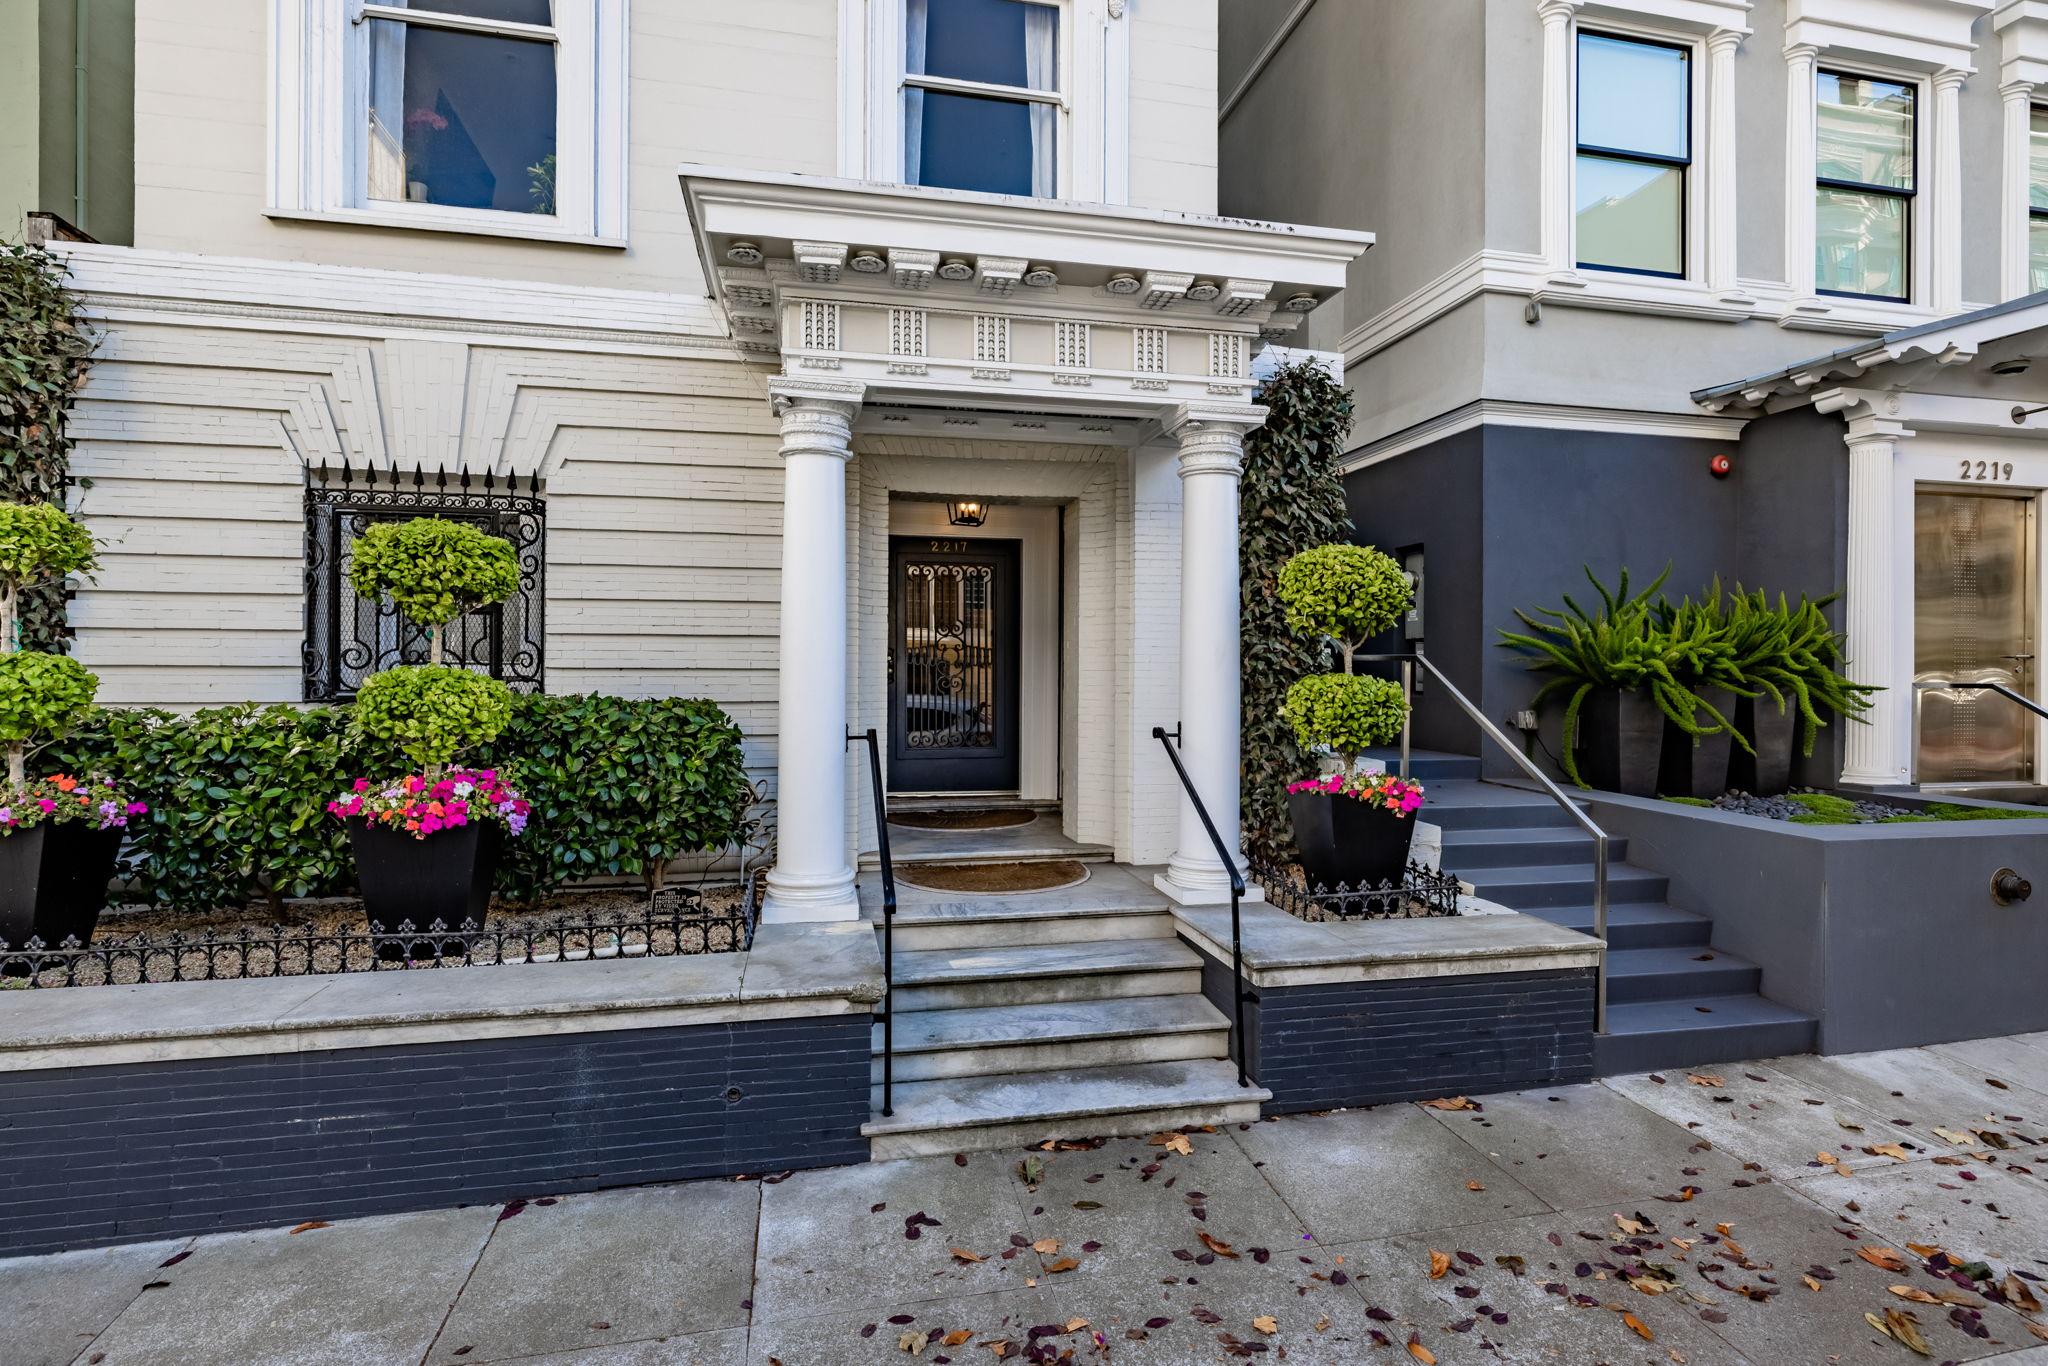 2217 Pacific Ave, San Francisco, CA 94115, USA Photo 113